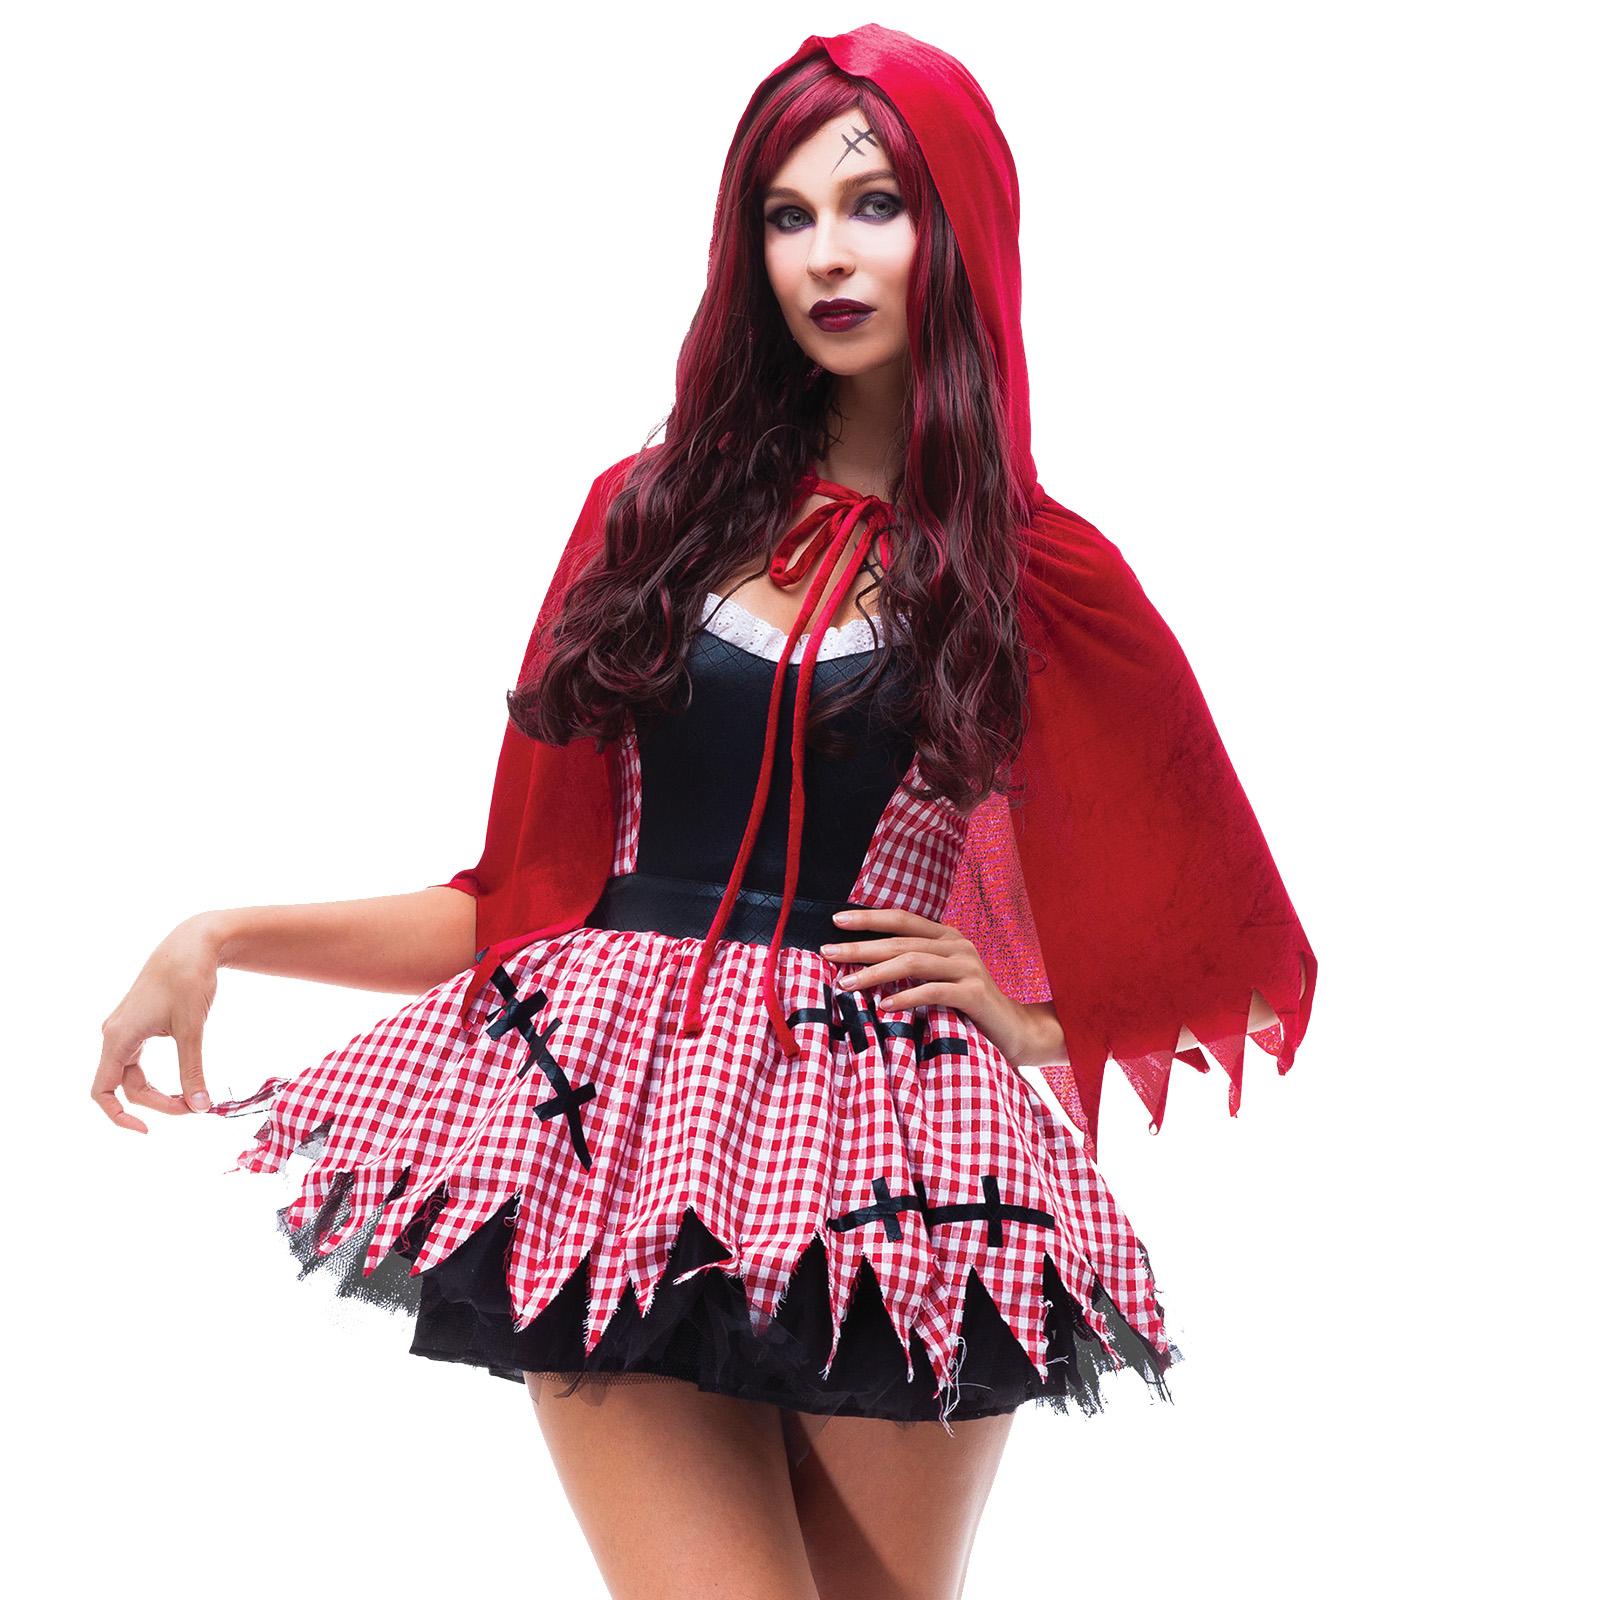 Disfraces Para Halloween De Caperucita Roja.Detalles De Disfraz De Vampiro Muerte Zombi Caperucita Roja Enfernera Halloween Para Adultos